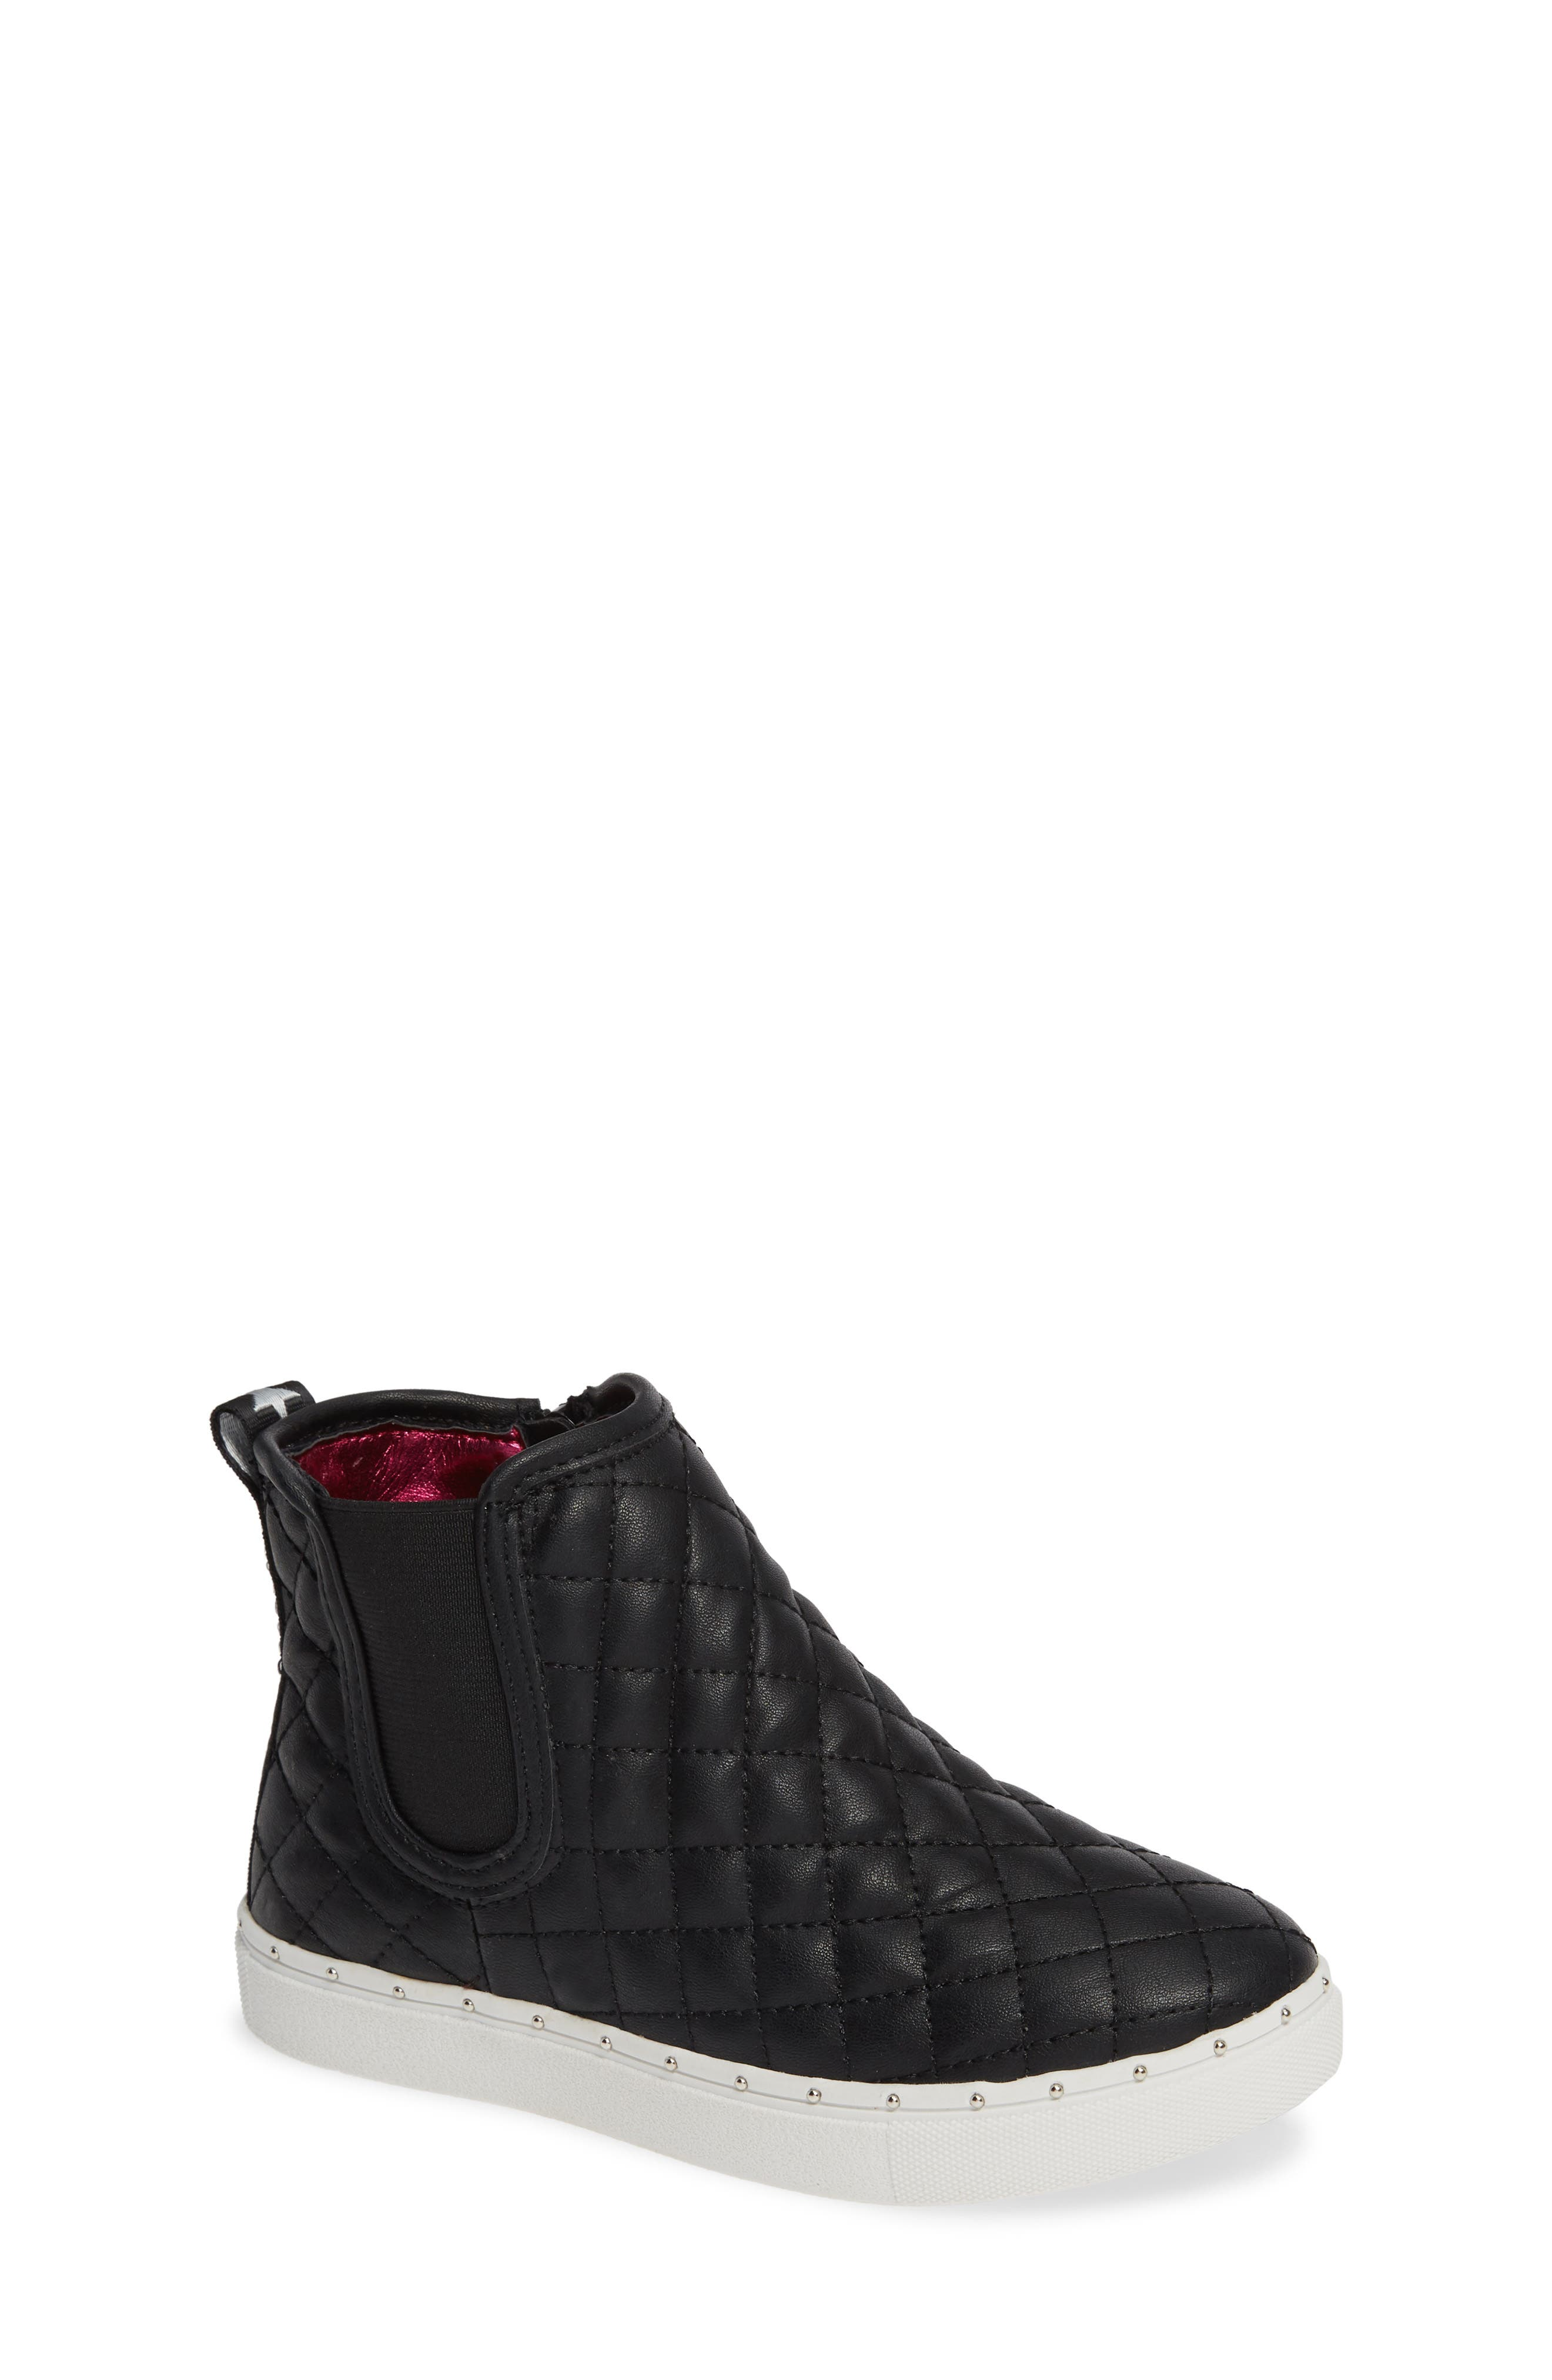 JQuest High Top Platform Sneaker,                             Main thumbnail 1, color,                             BLACK